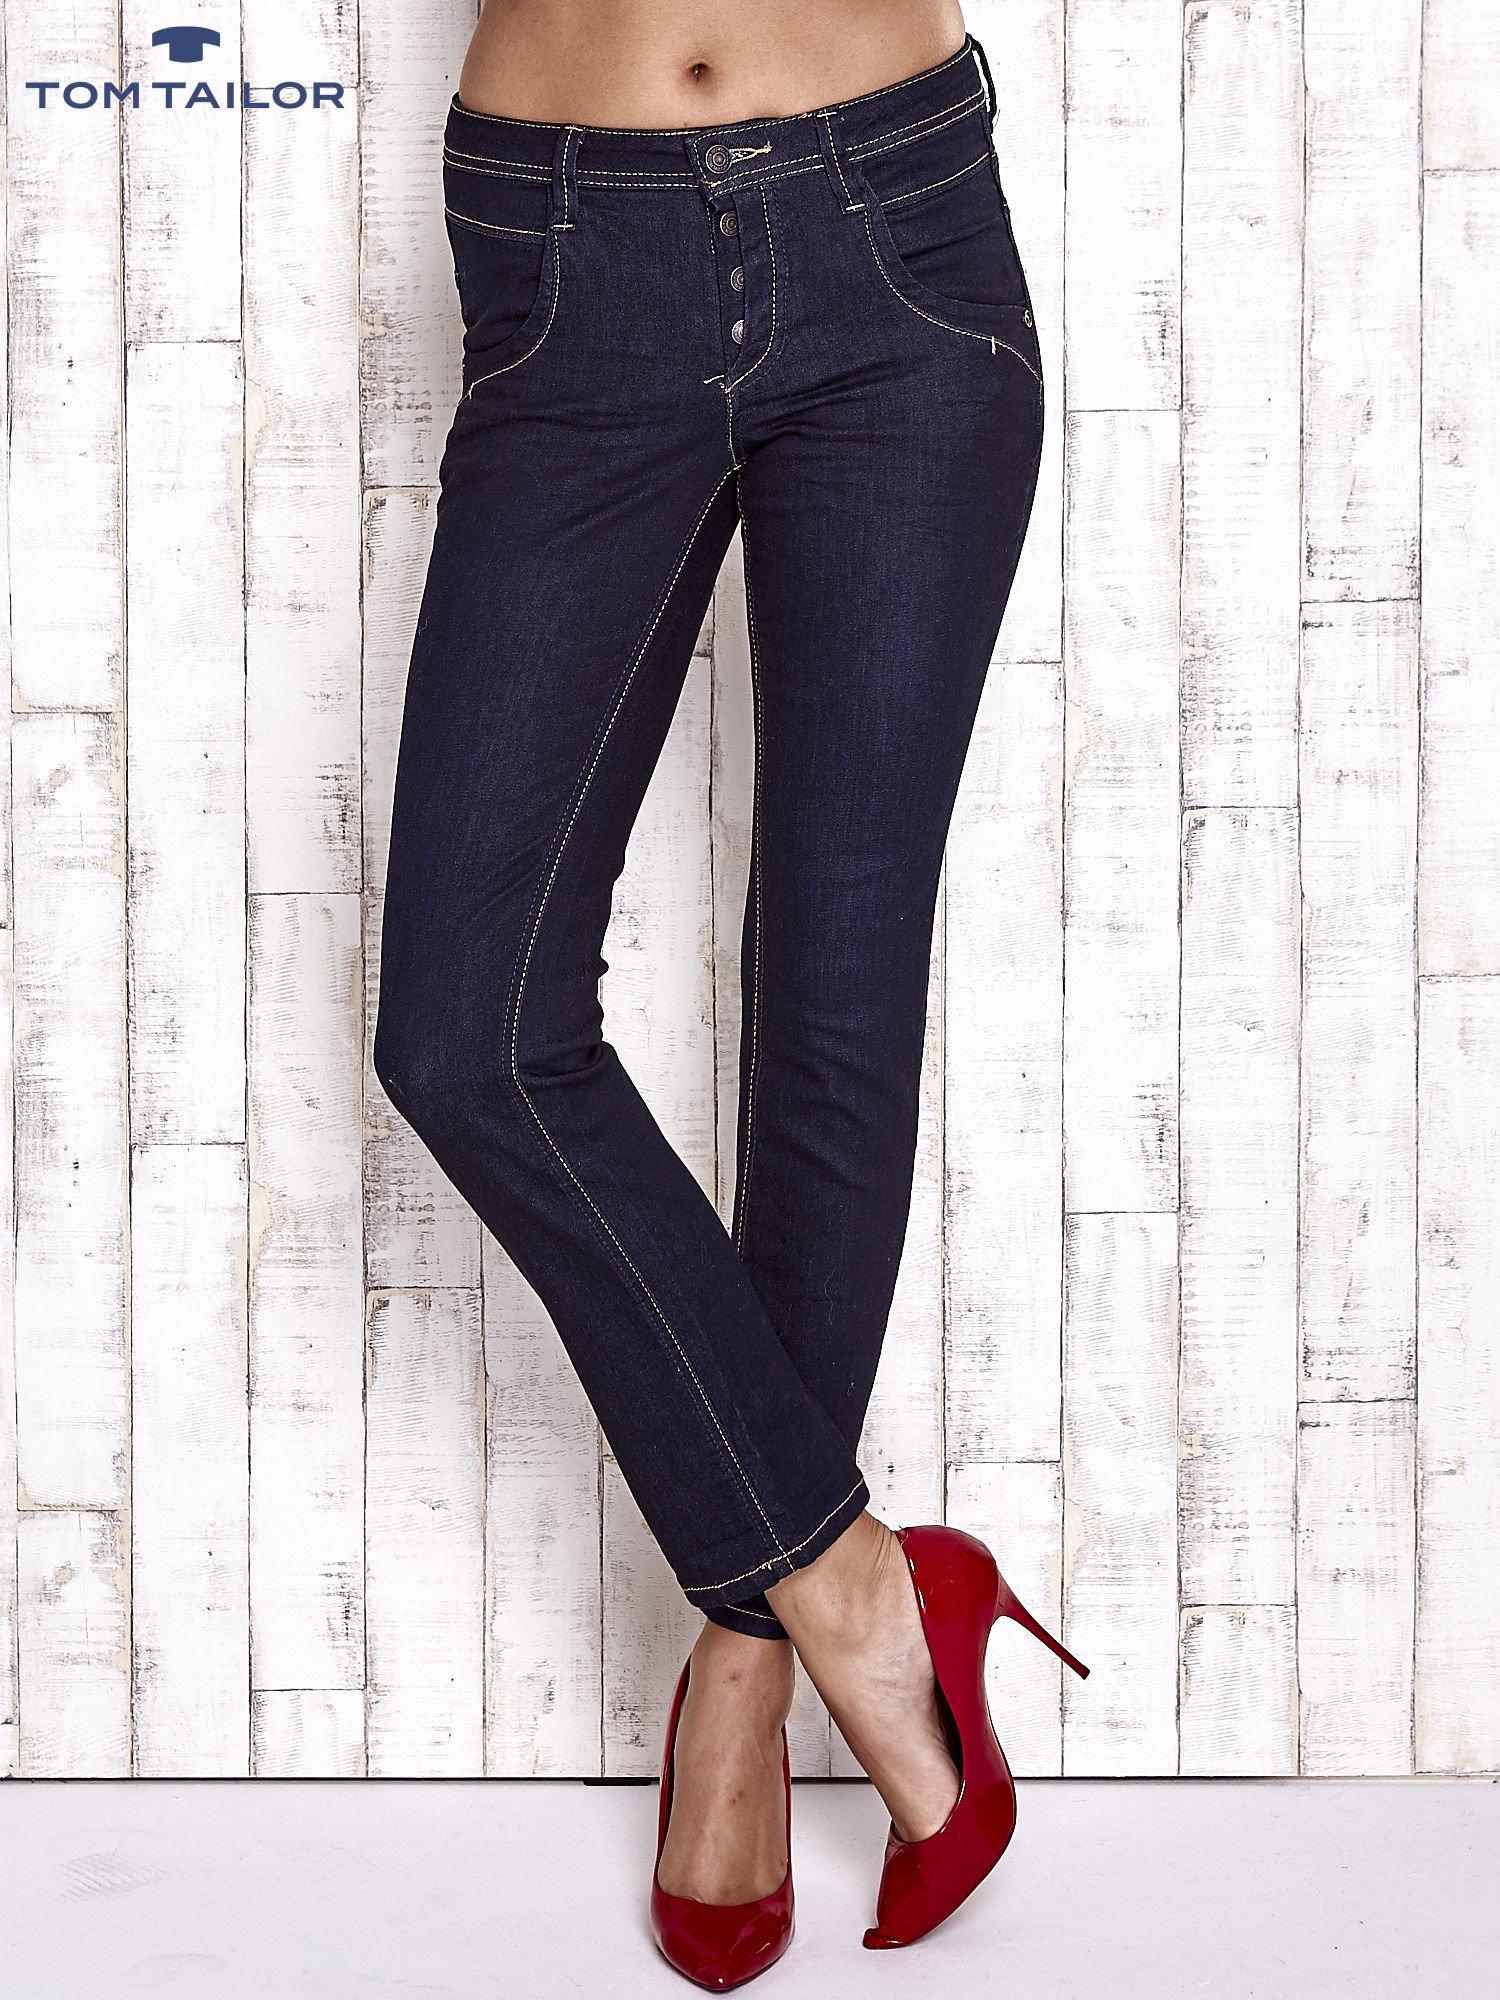 TOM TAILOR Granatowe spodnie regular jeans                                  zdj.                                  1